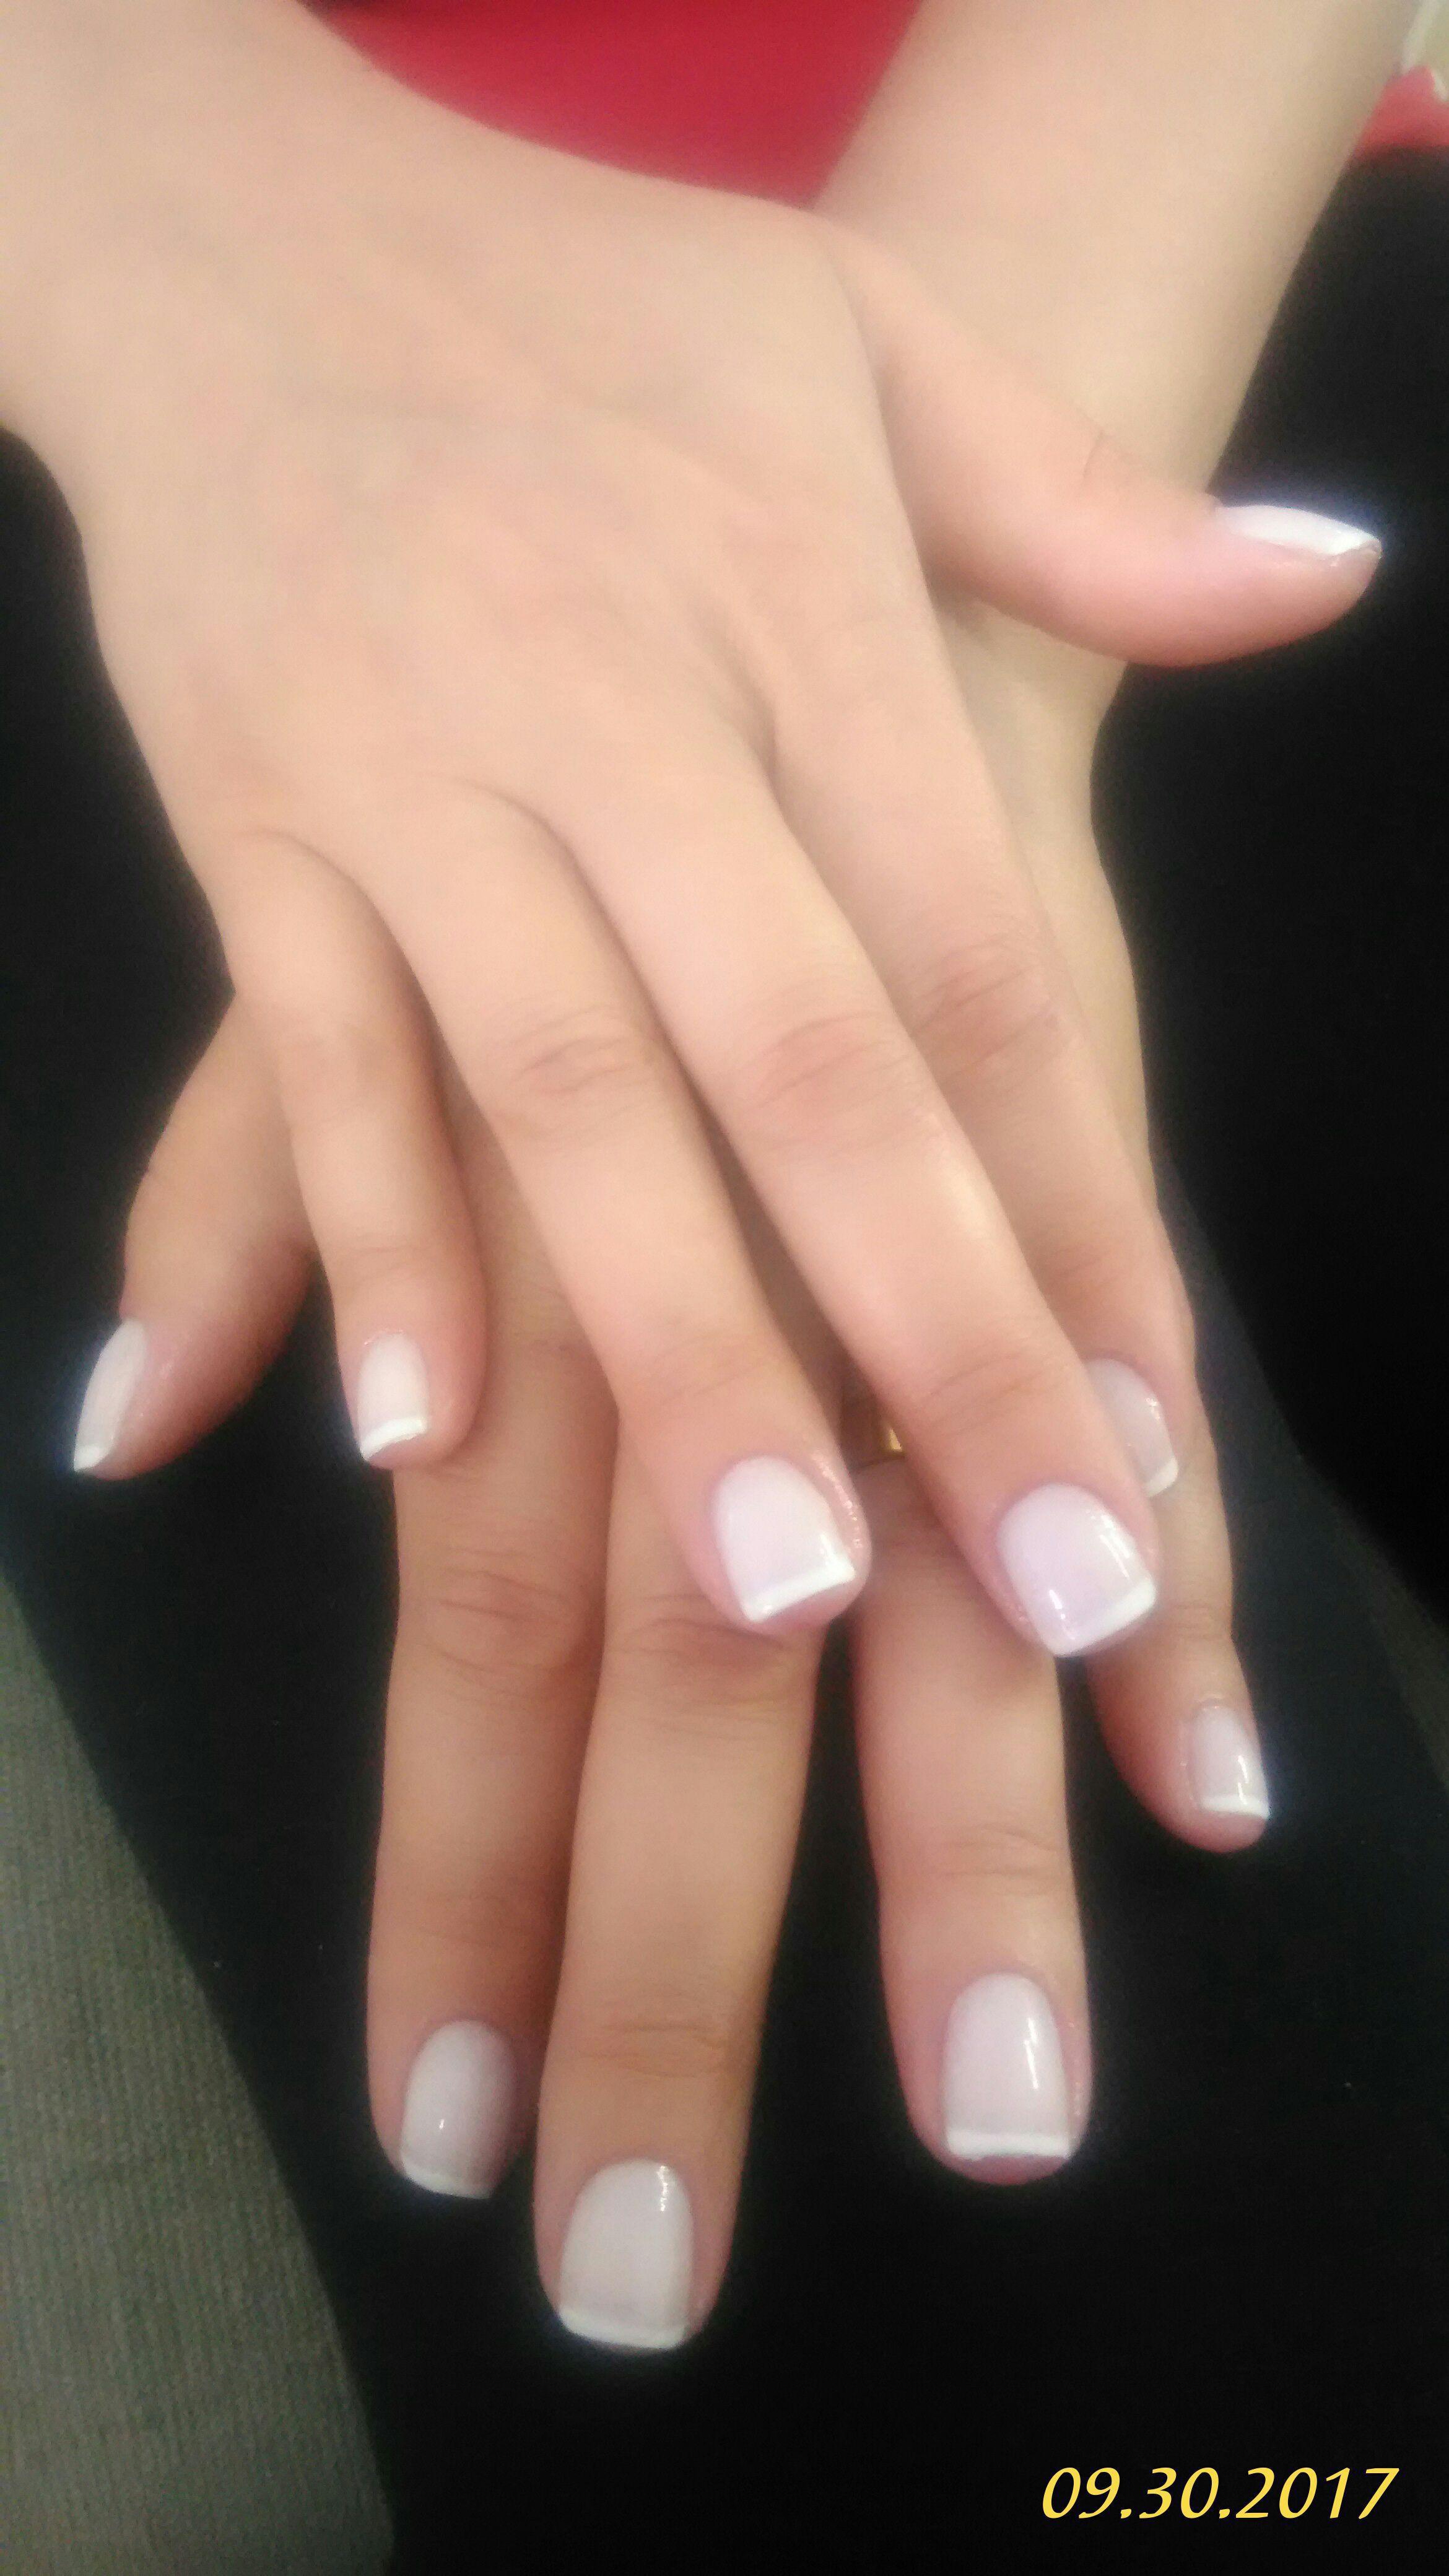 #helobeauty #manicureepedicure #unhas #trabalhocomamor unha manicure e pedicure depilador(a) estudante (esteticista)